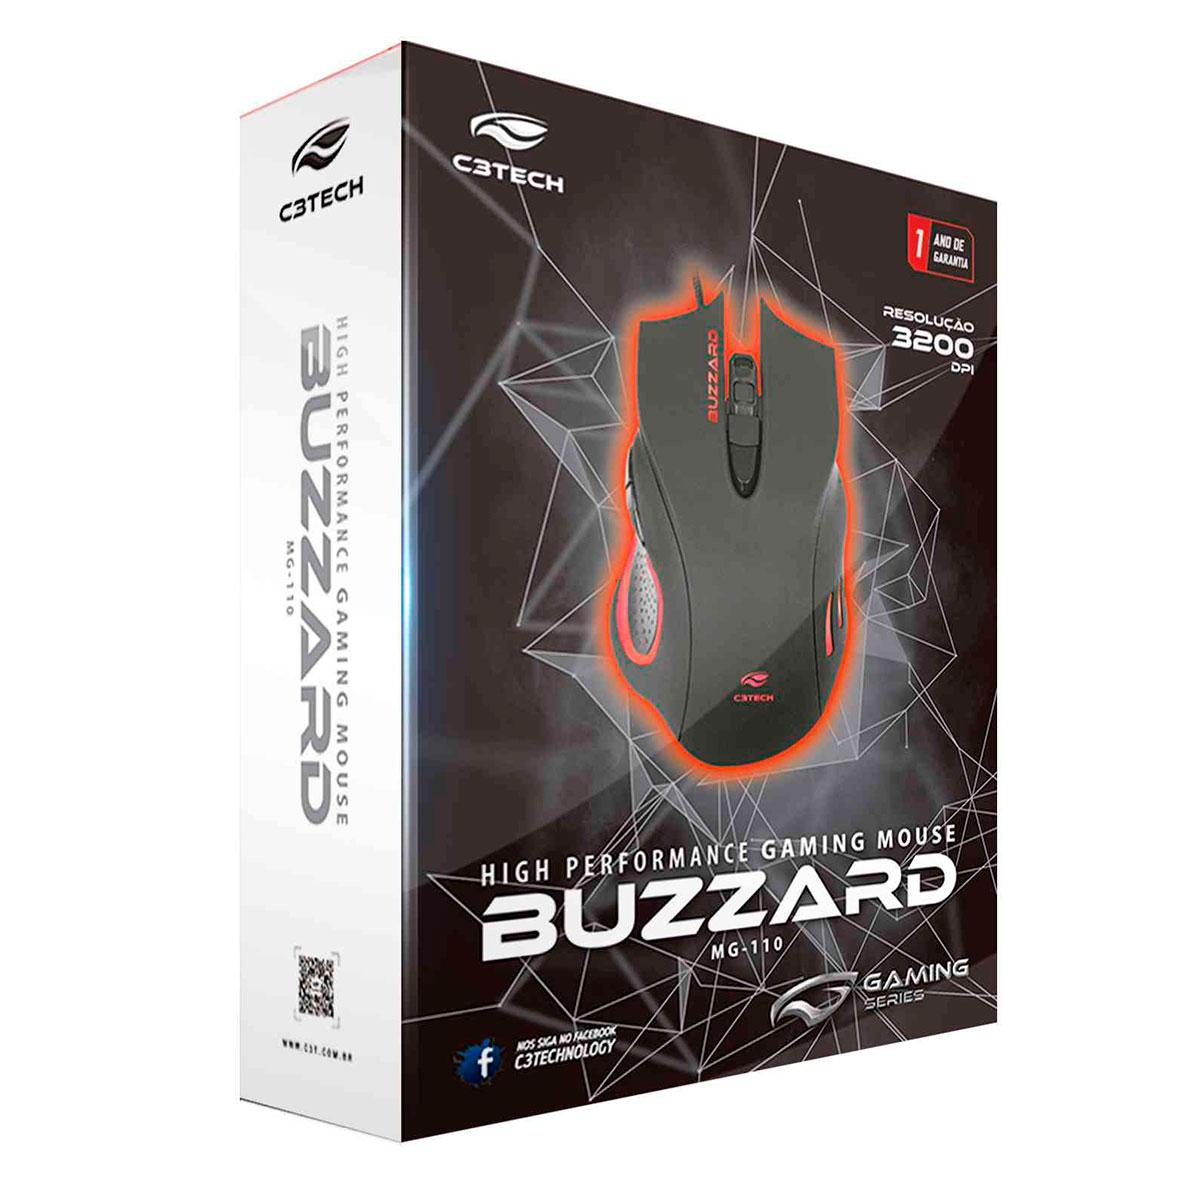 Mouse Gamer C3Tech Buzzard MG-110BK, USB, 3200DPI, LED, Preto